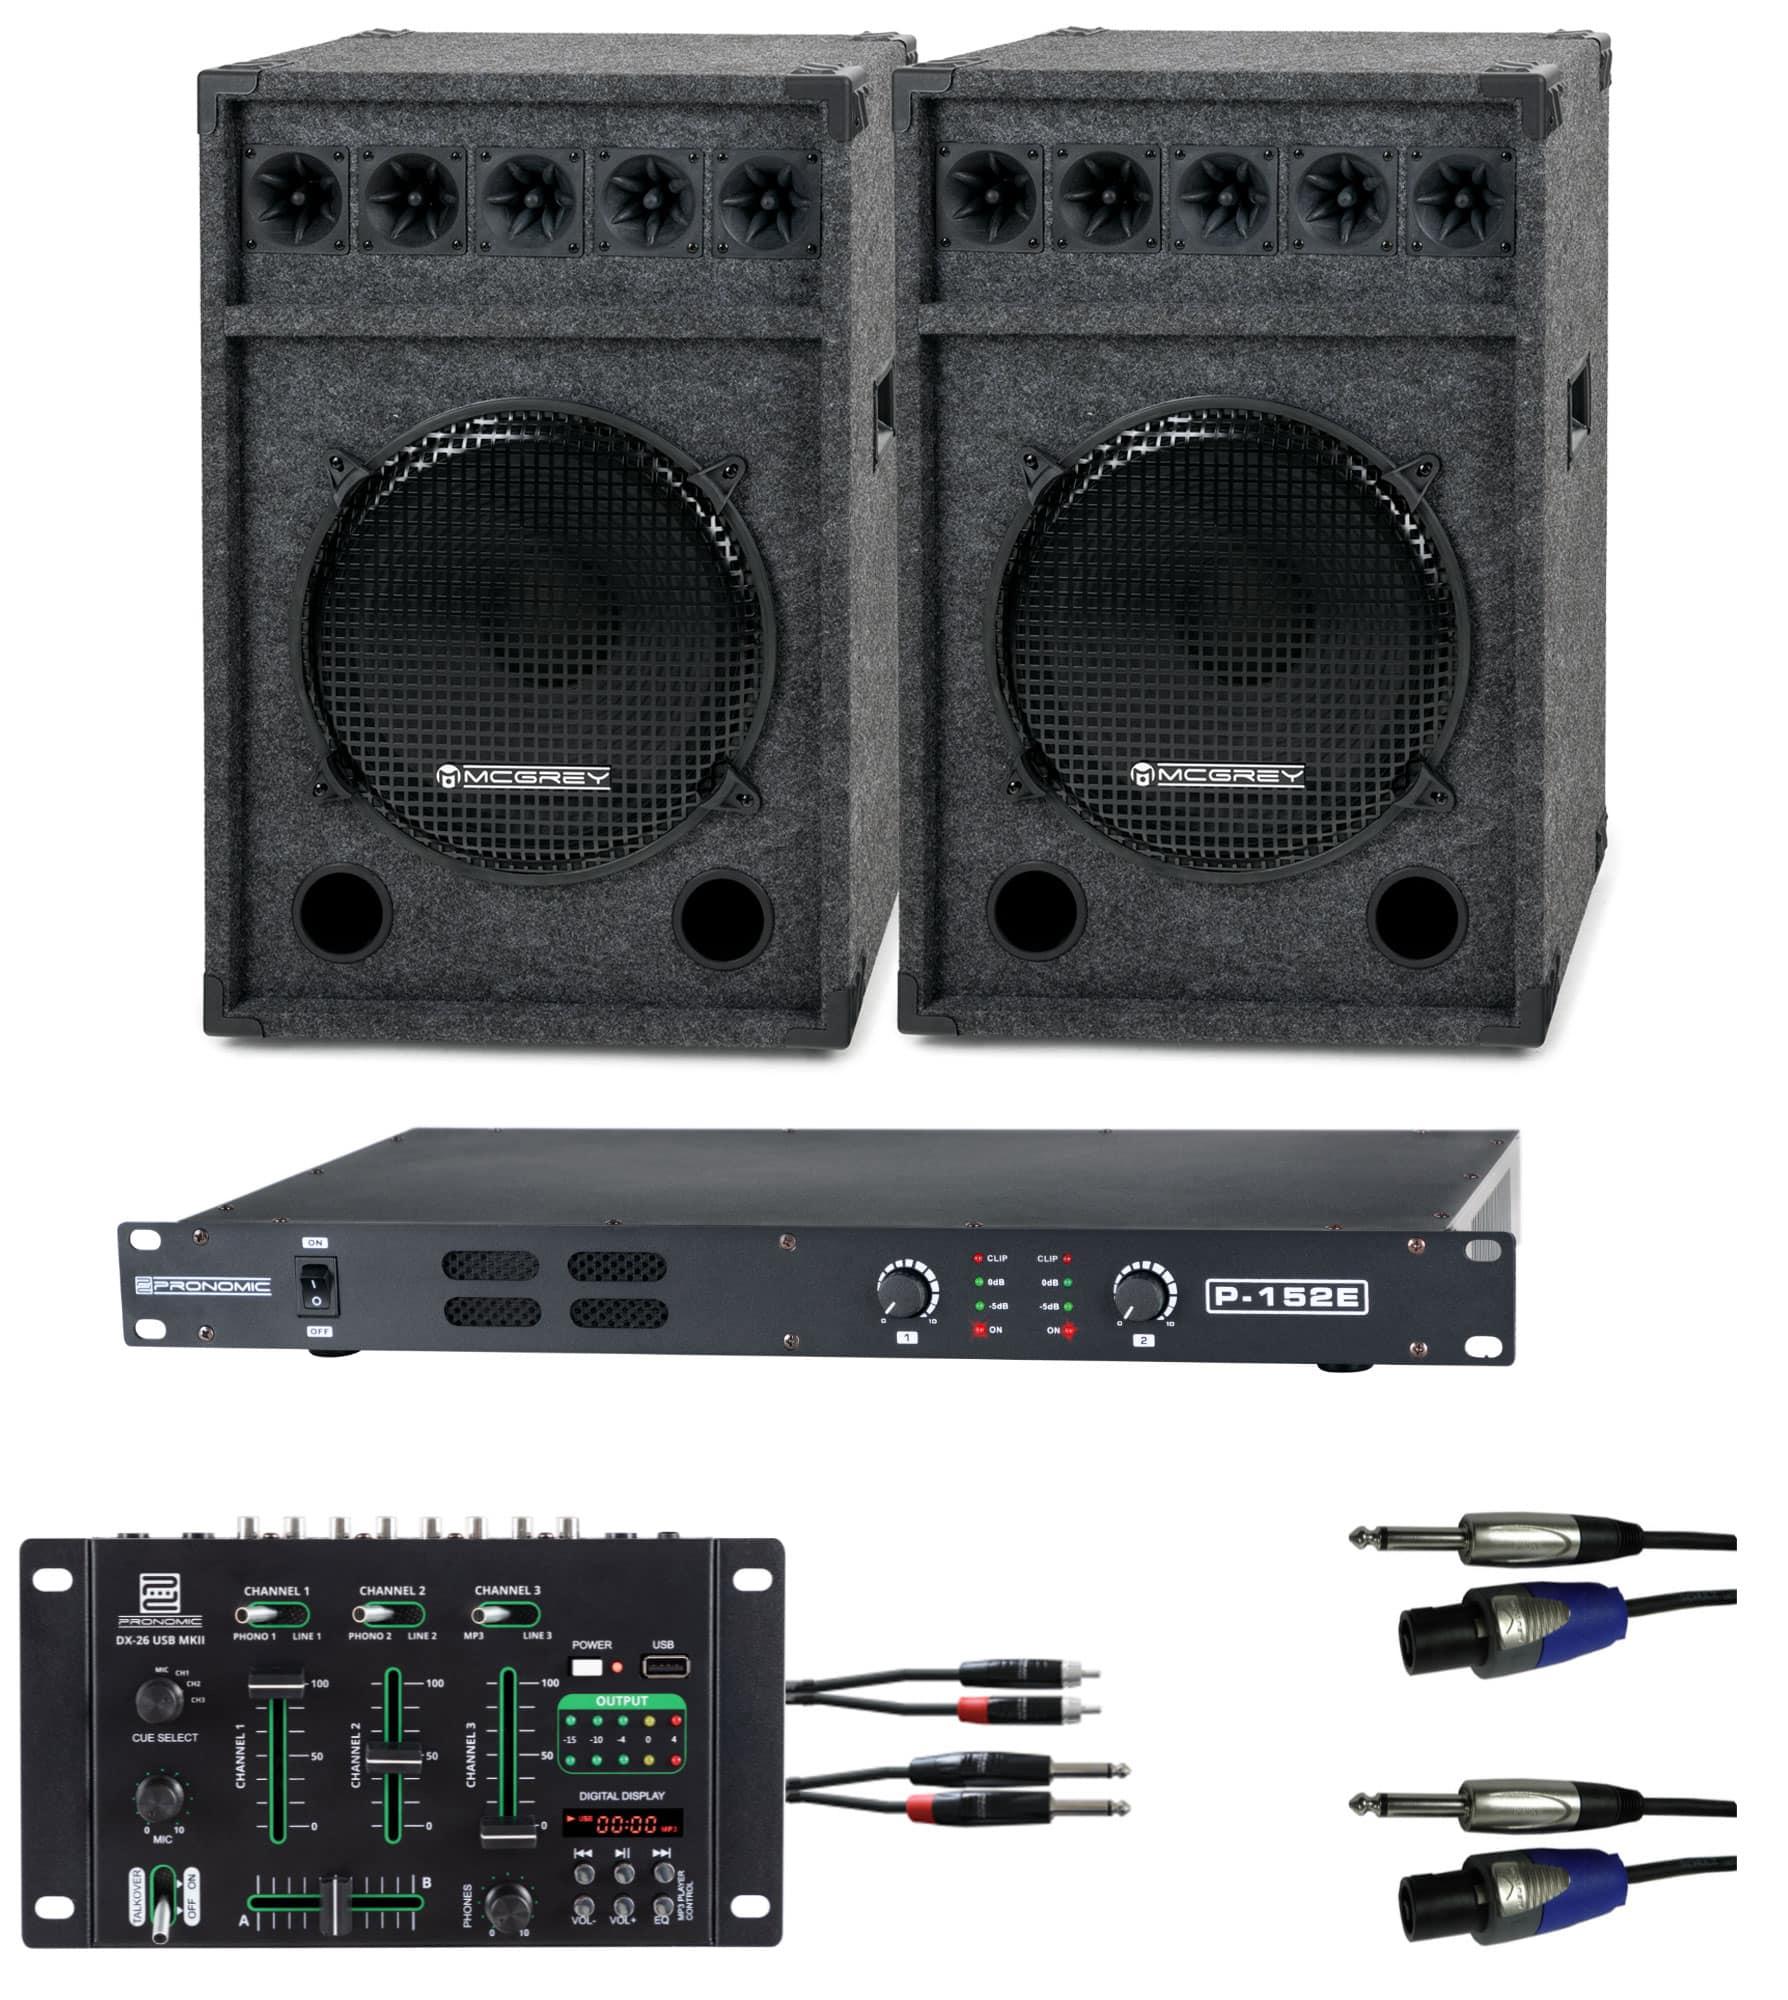 Djkomplettanlagen - Pronomic DJ Party Set II Komplettset 2x Festival 15 Box, 1x Mixer, Endstufe, Kabel - Onlineshop Musikhaus Kirstein